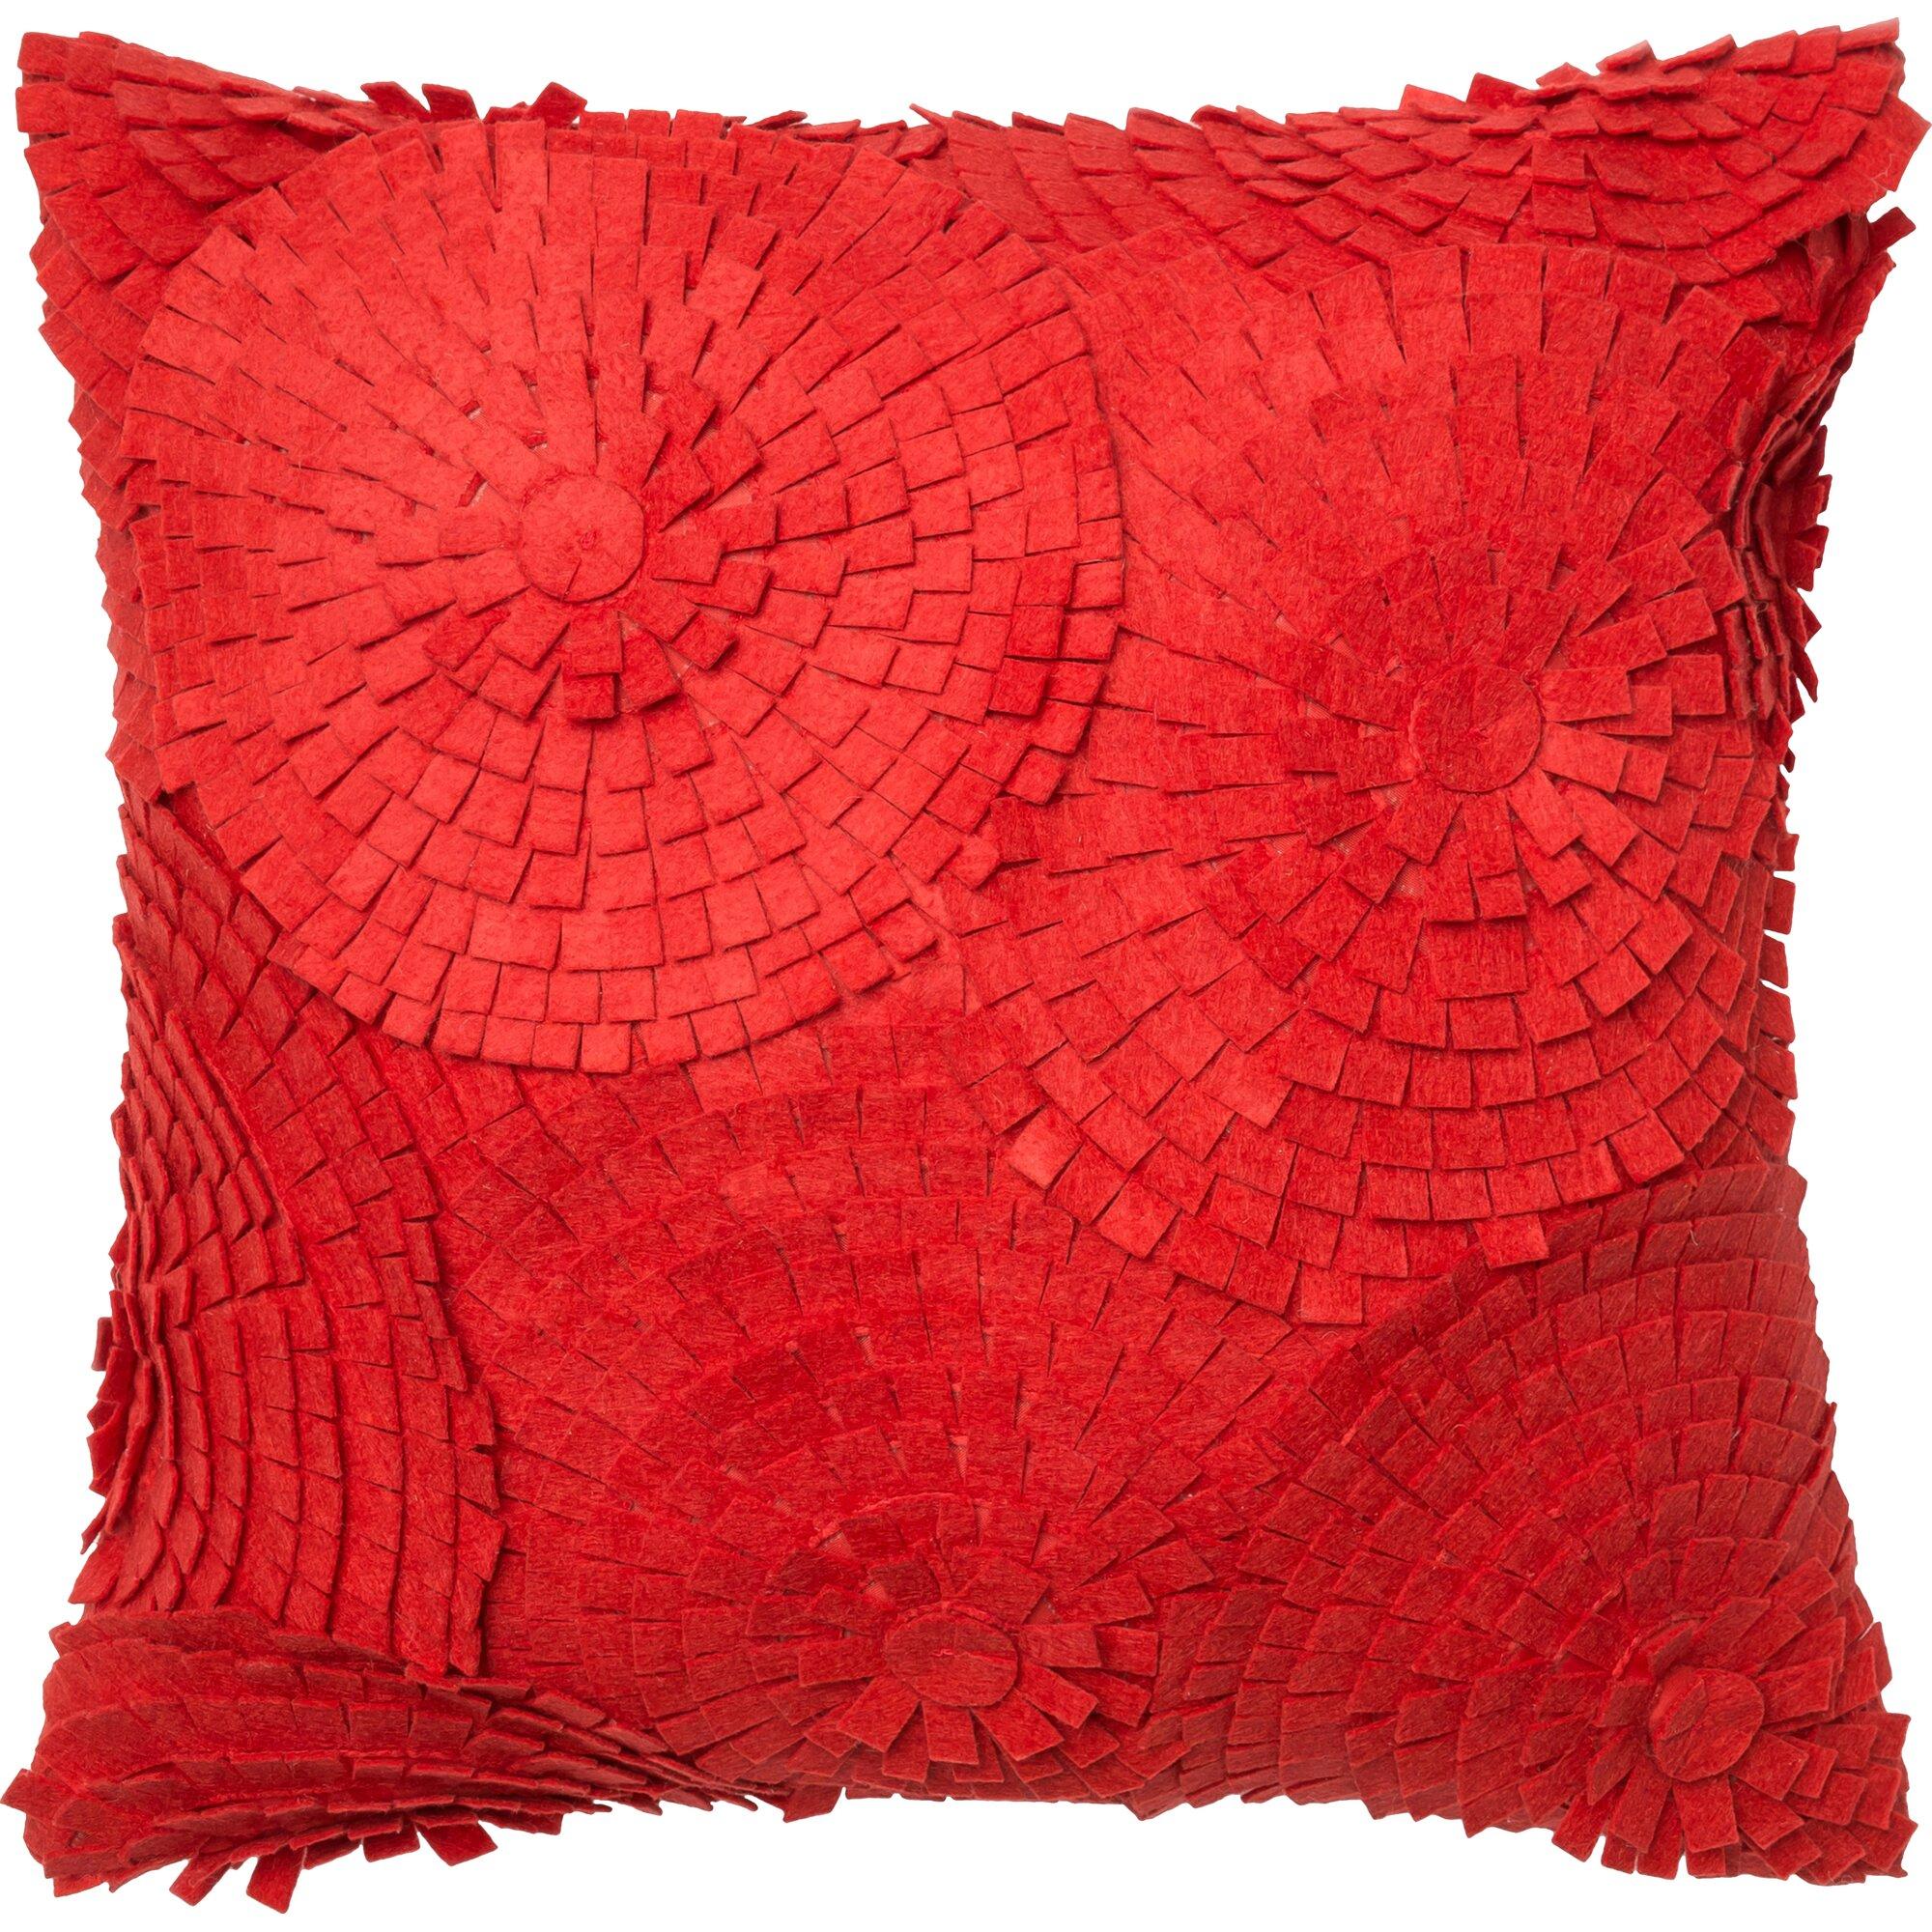 Loloi Rugs Cotton Throw Pillow & Reviews Wayfair